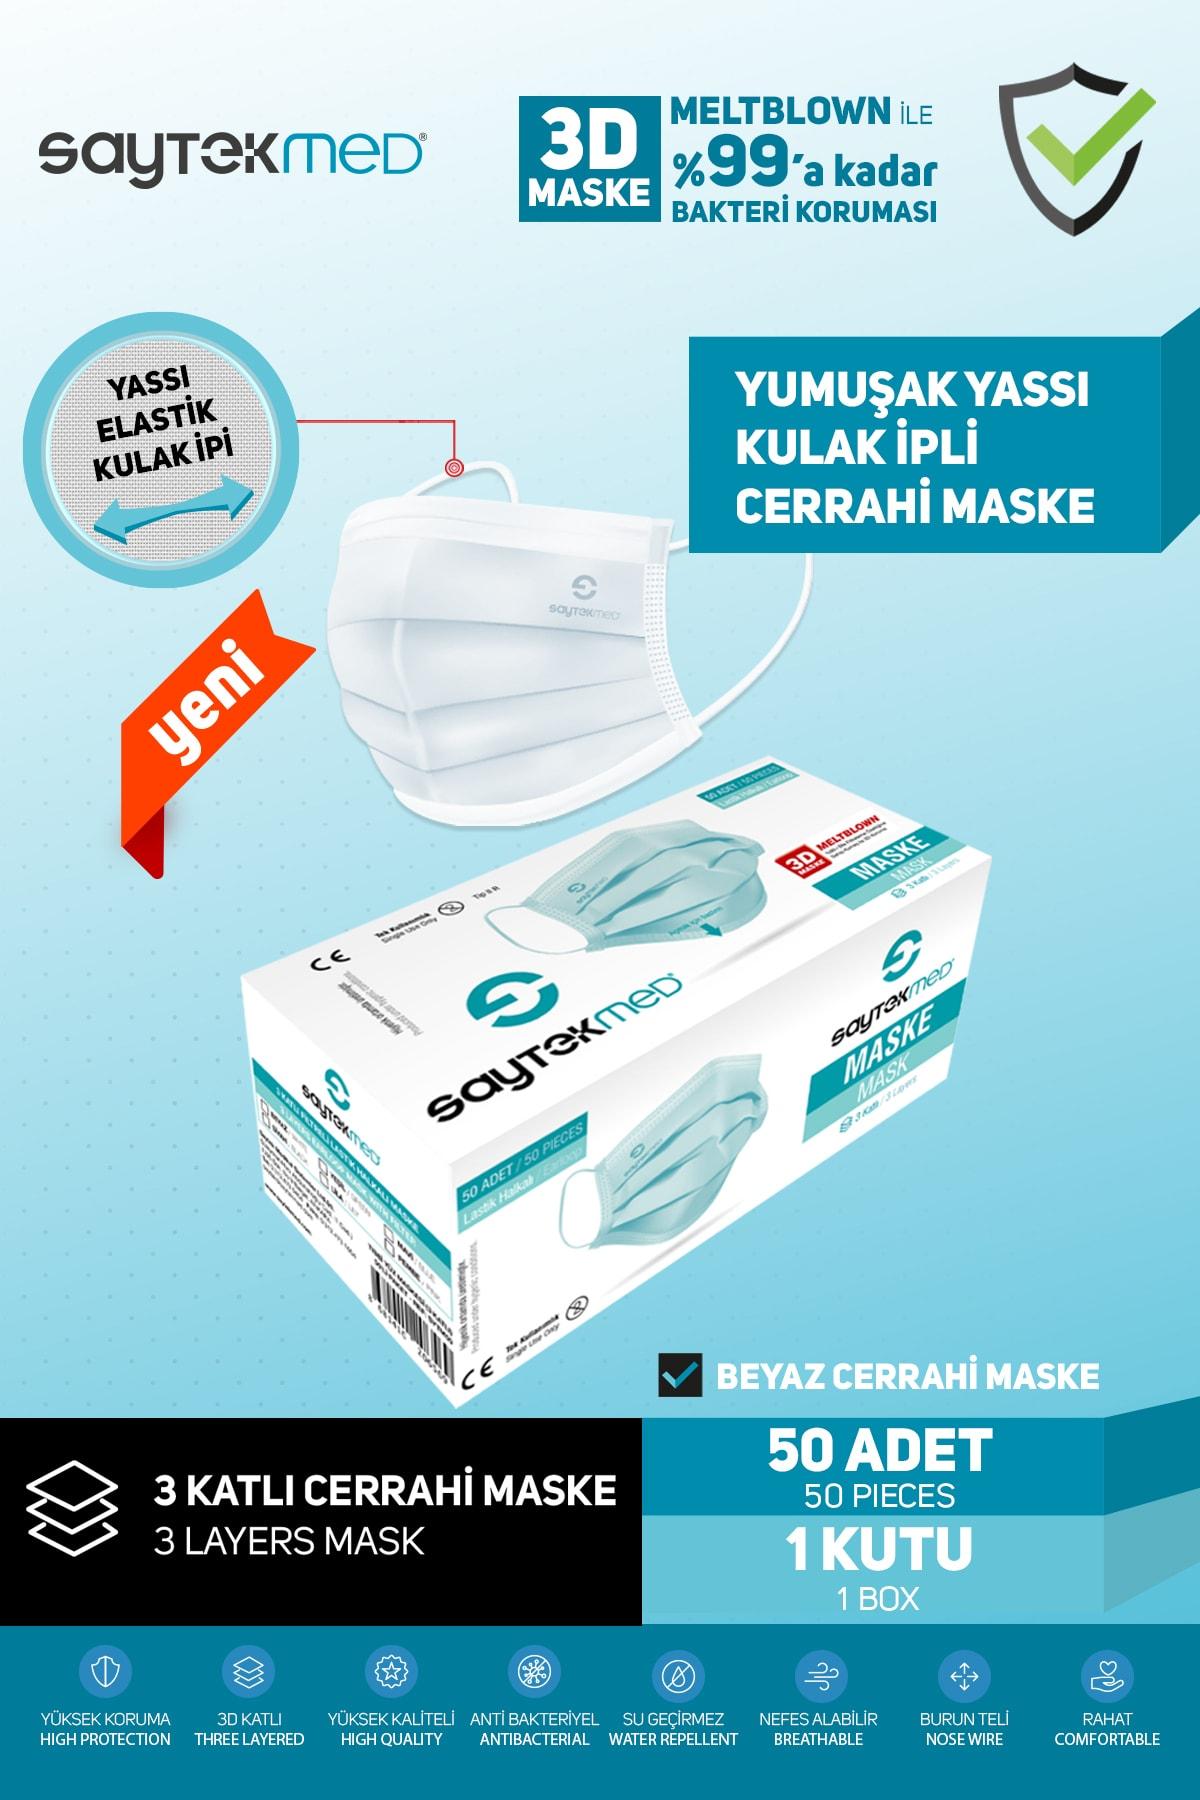 SAYTEKMED Meltblown Filtreli, Yassı Kulak Ipli, Beyaz Cerrahi Maske (50 Adet/1 Kutu) 2